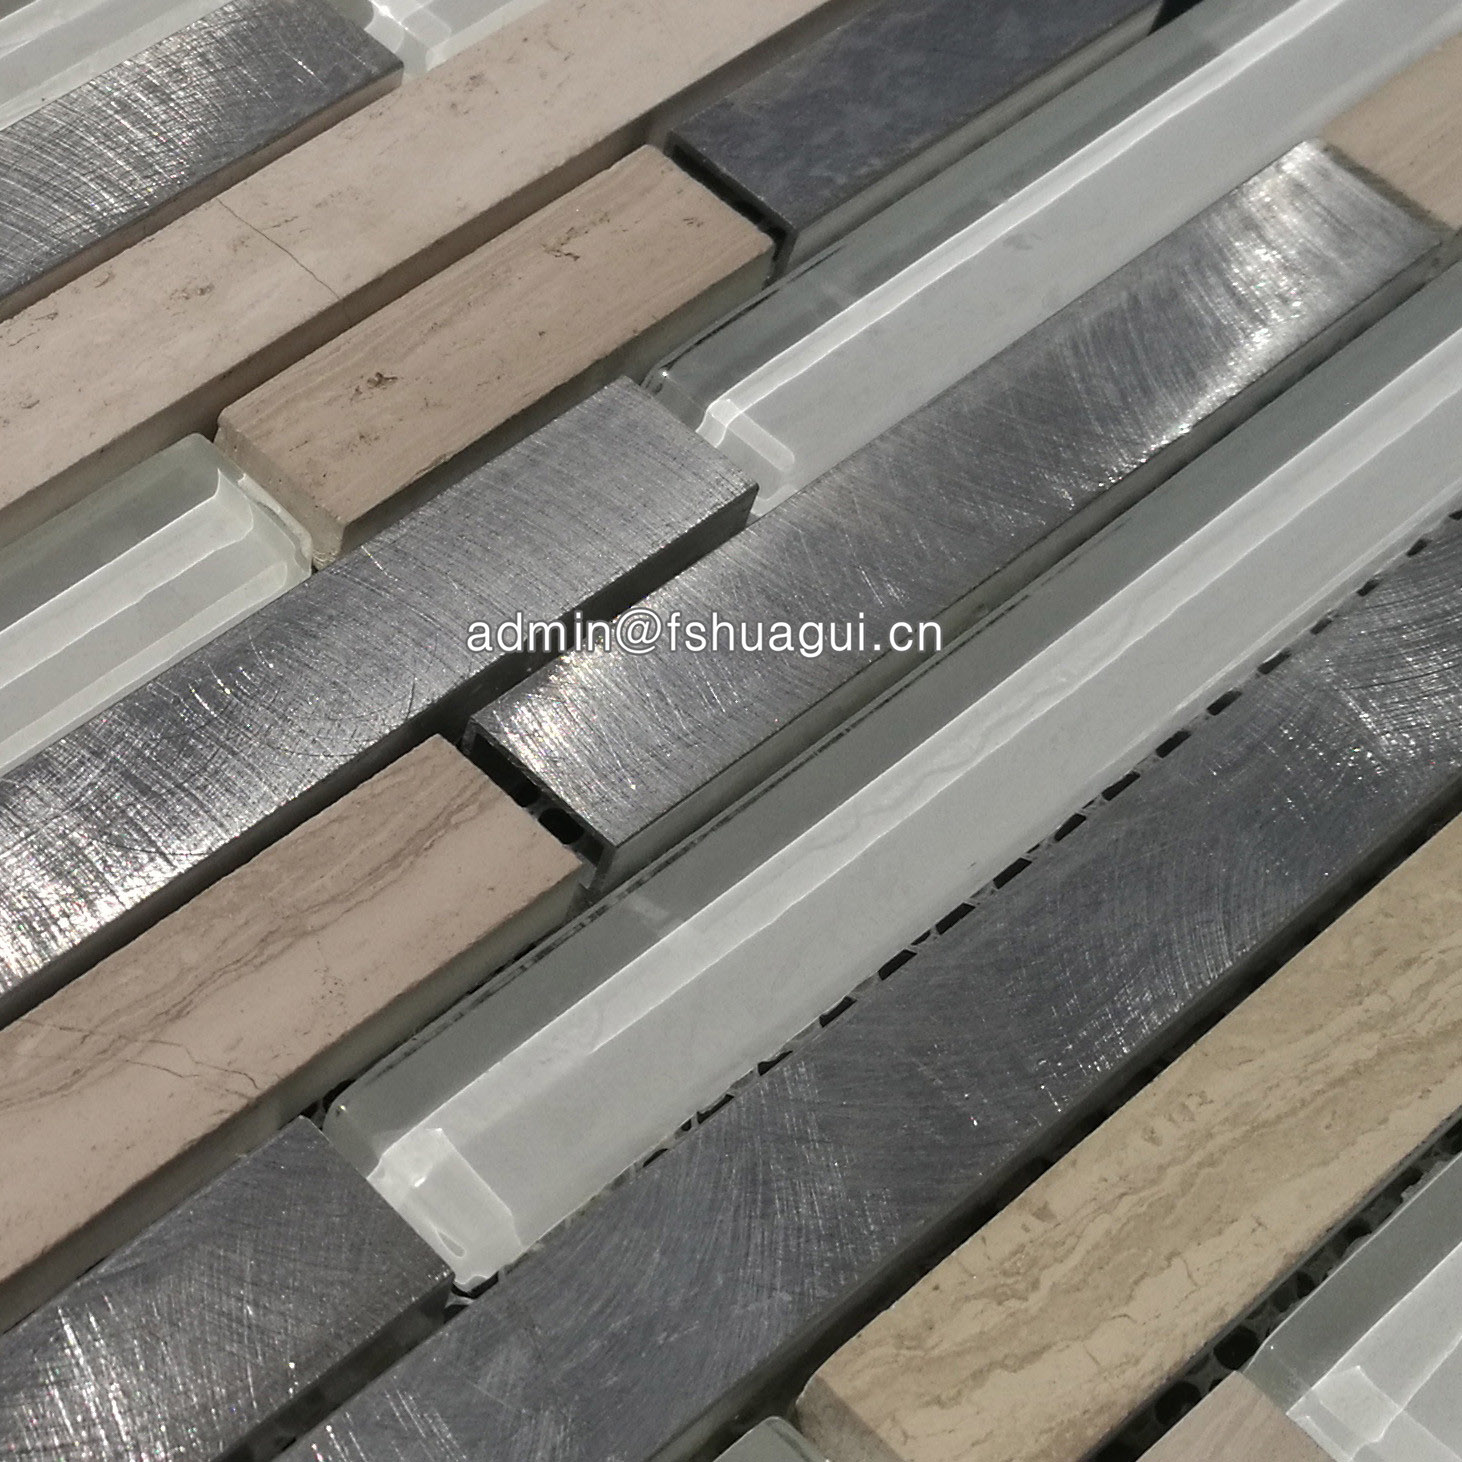 Huagui Linear white glass stone metal tile mosaic HG-WJ408 GLASS MOSAIC TILE image25